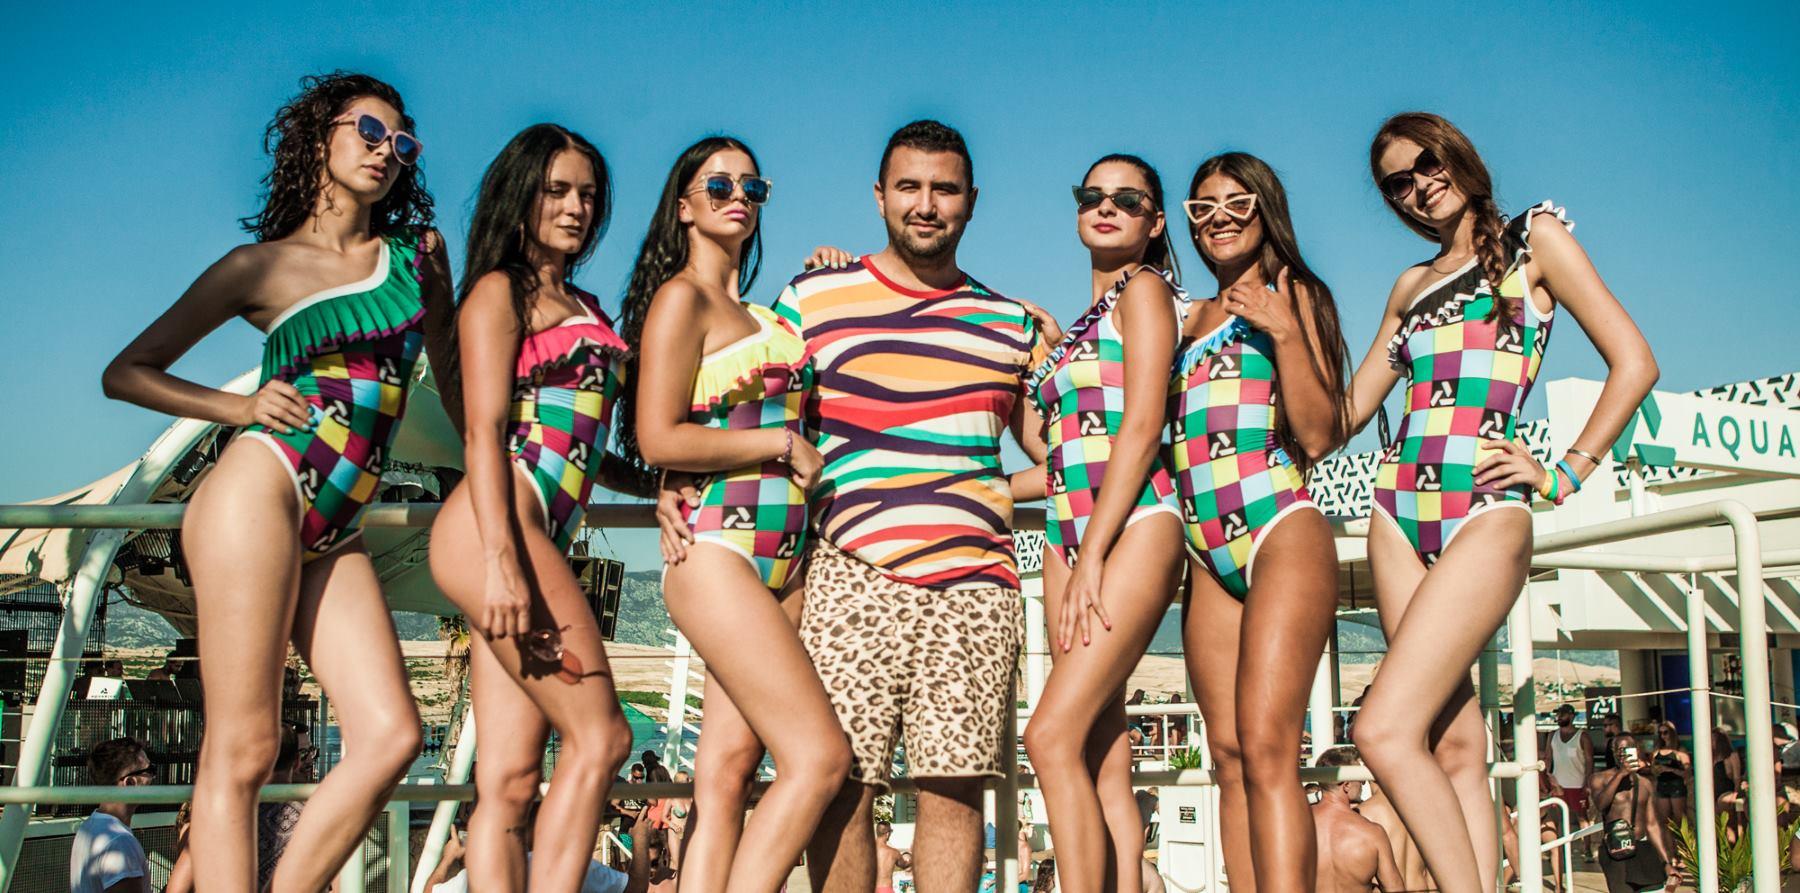 FOTO: Nastavljena ljetna suradnja dizajnera Zorana Aragoviča i kluba Aquarius